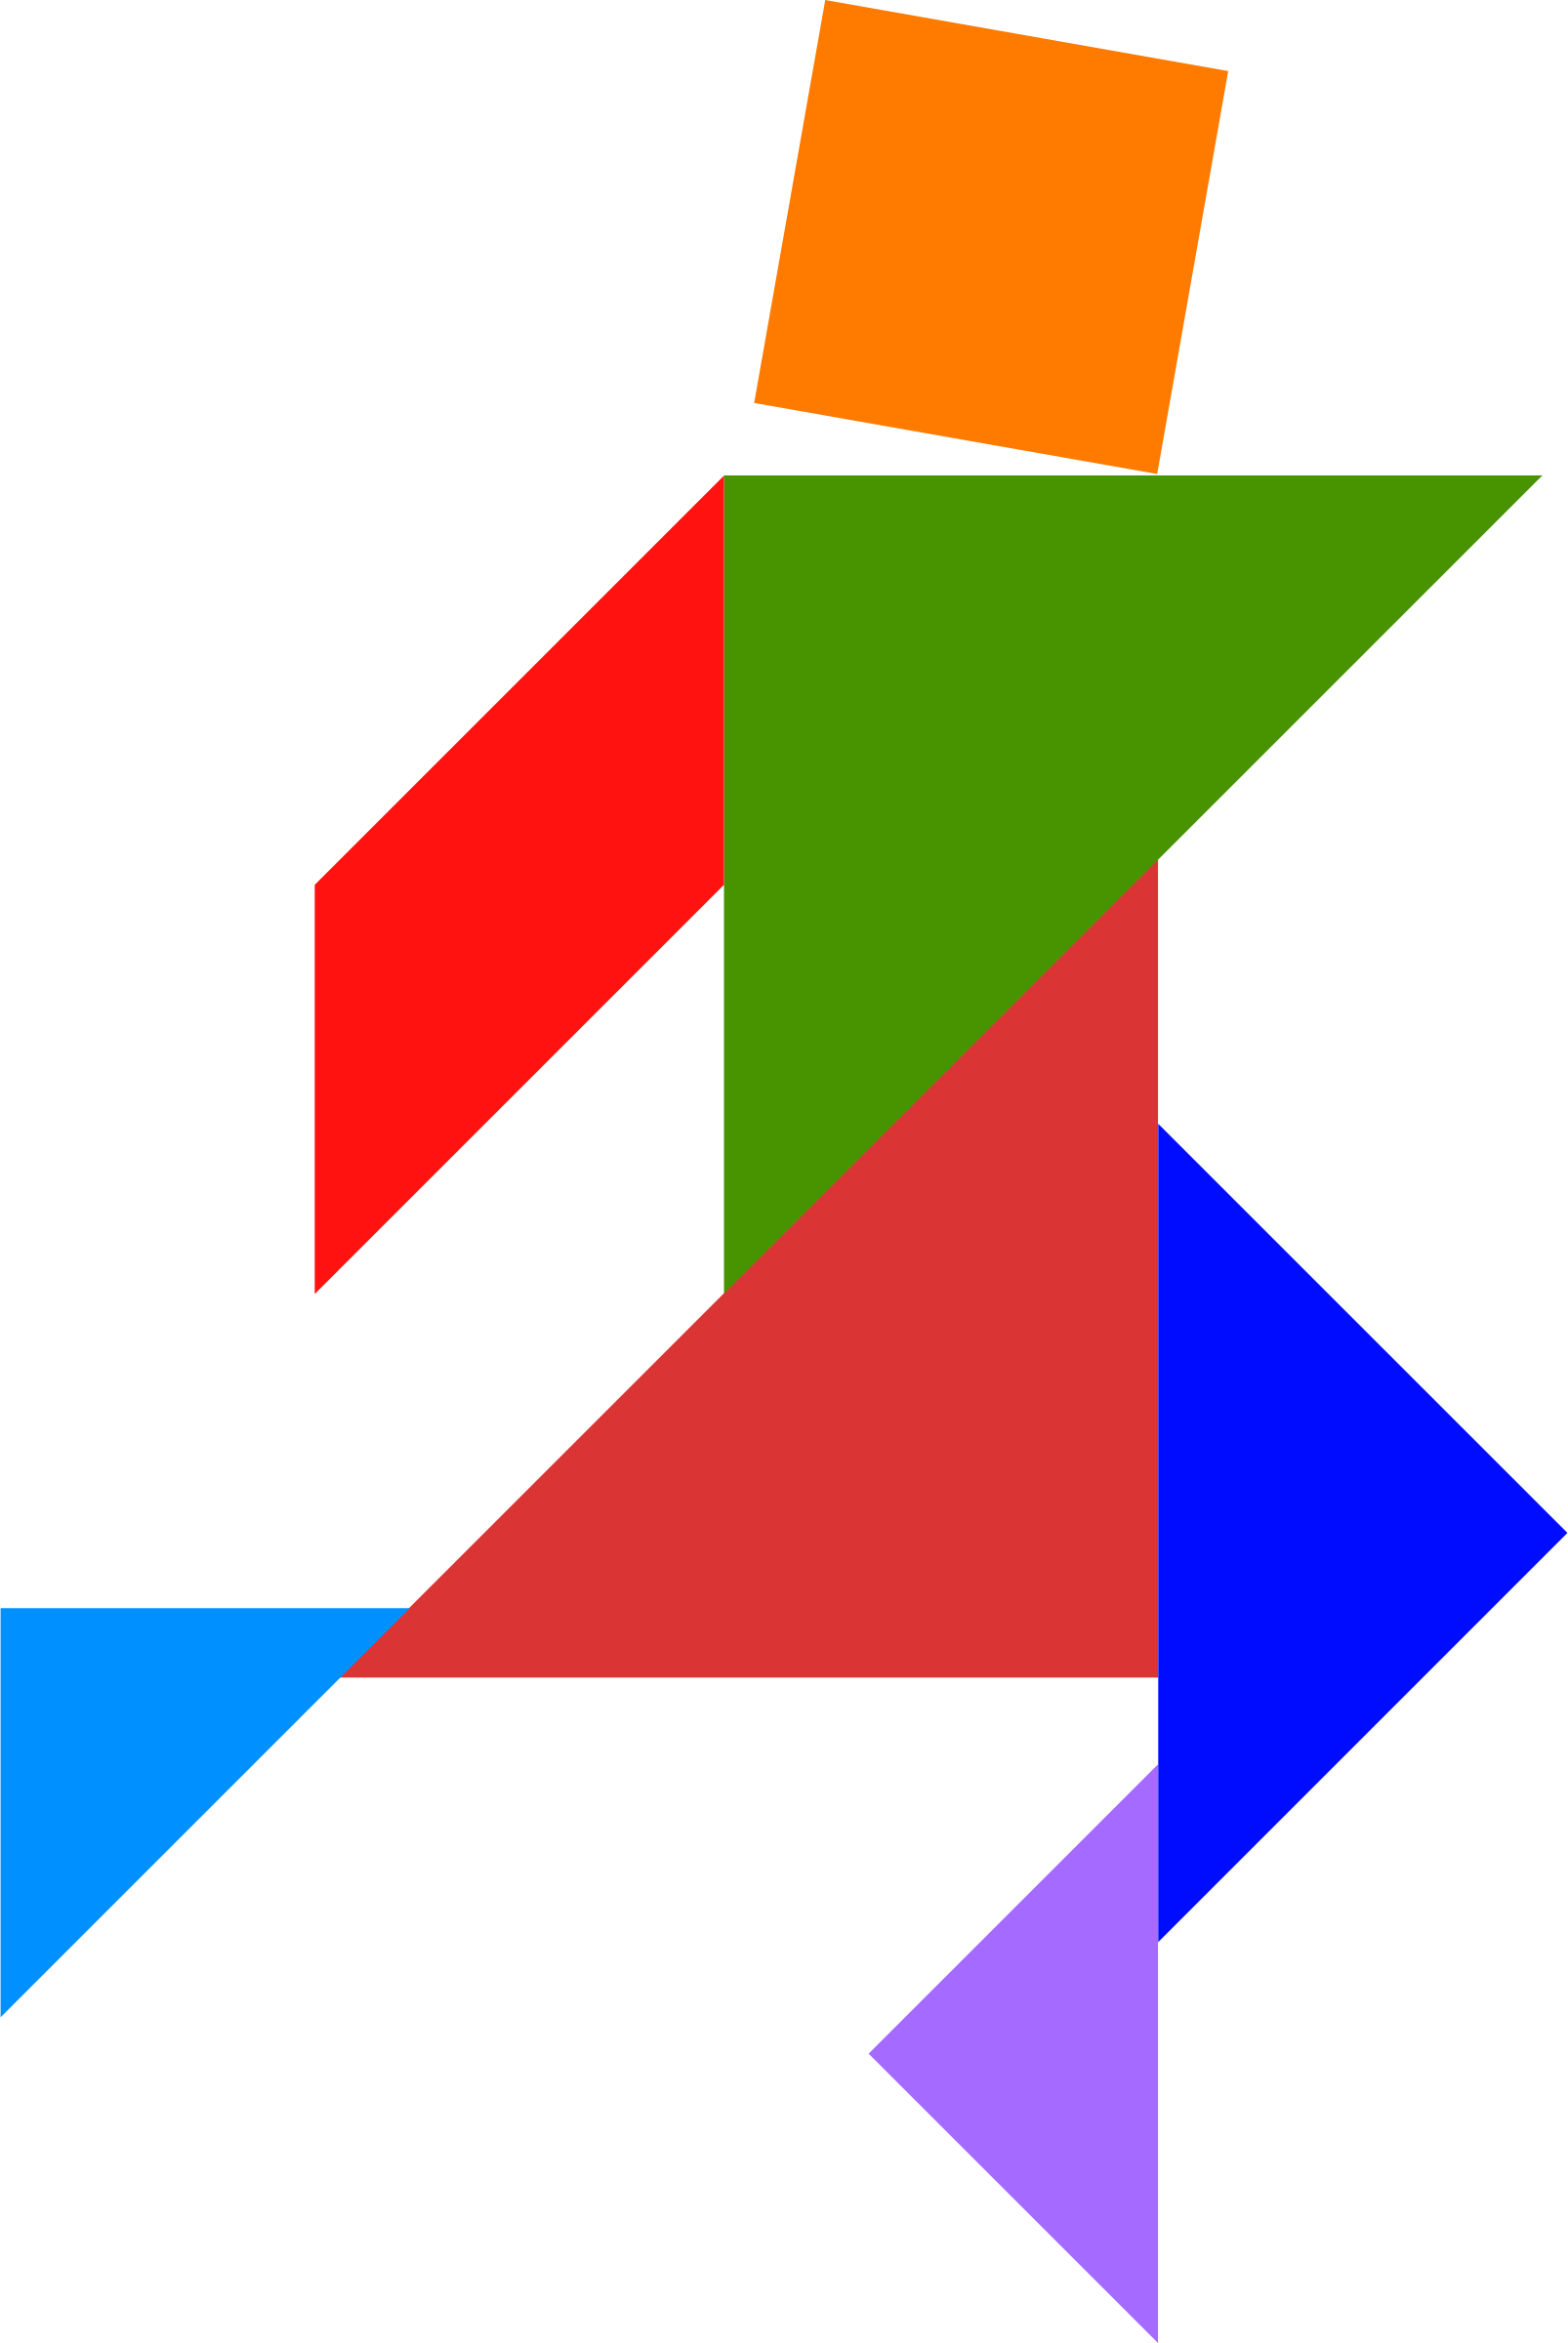 Tangram SVG Vector, Tangram Clip art - SVG Clipart